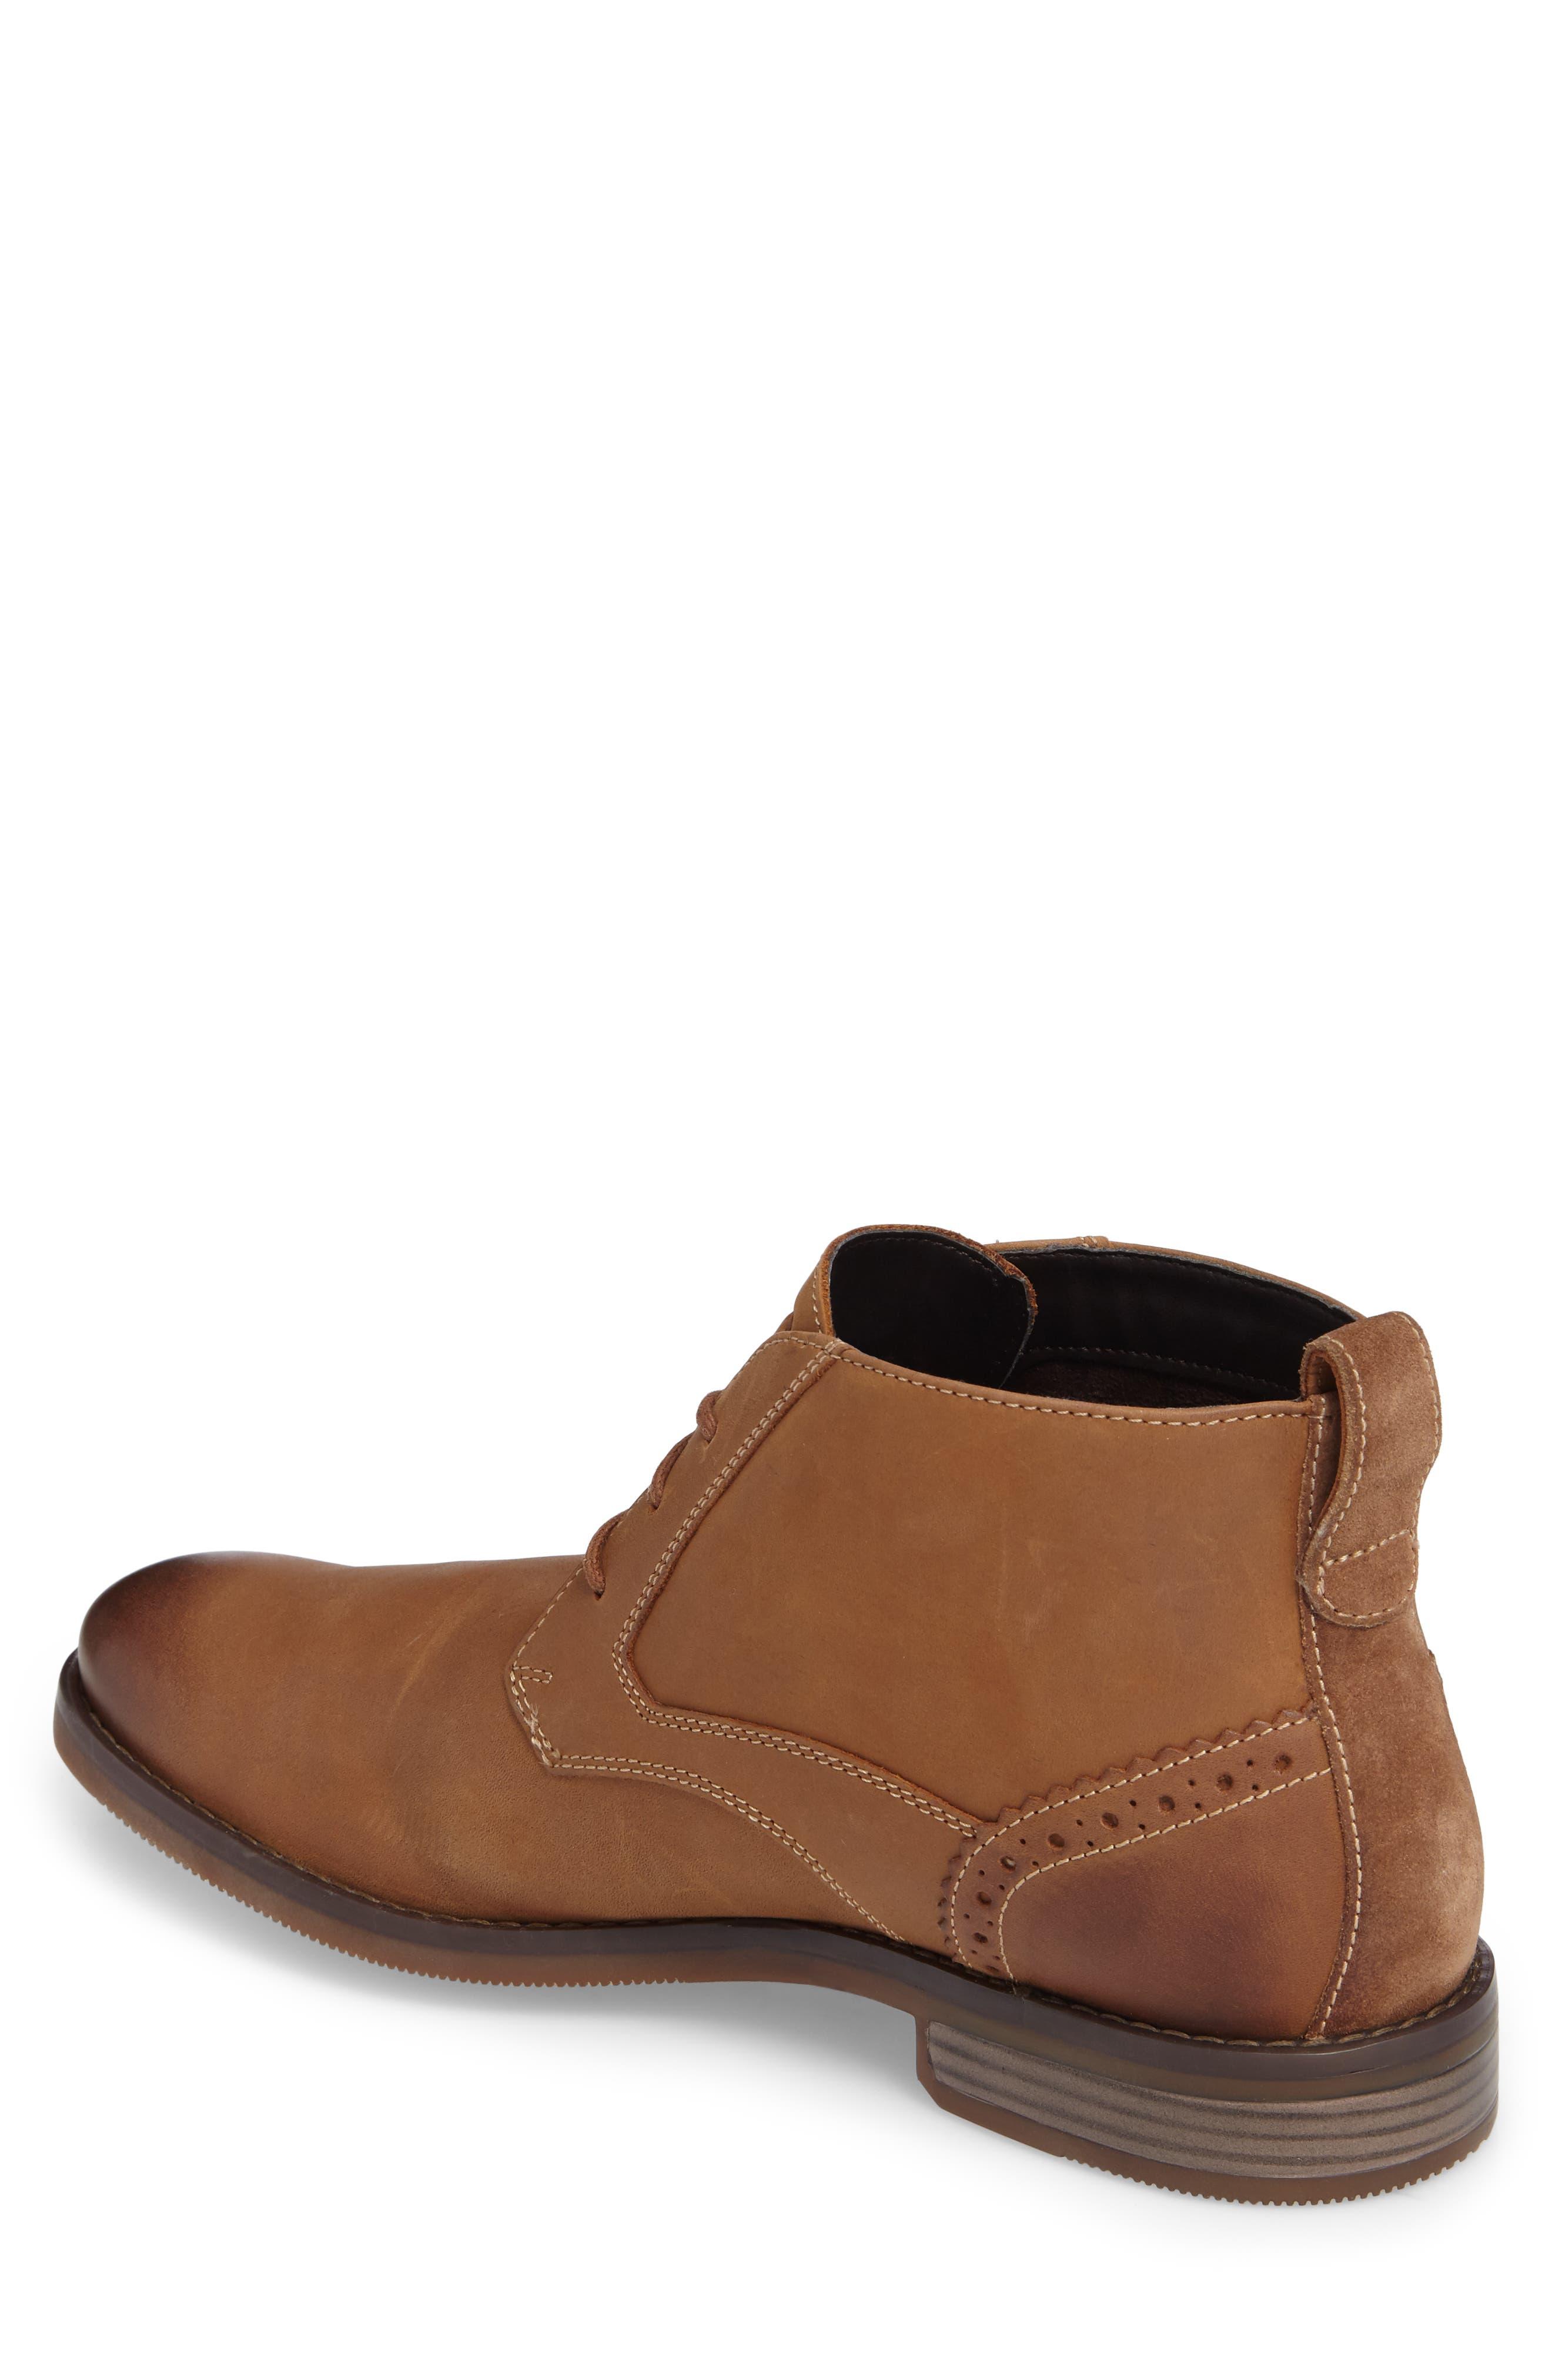 Wynstin Chukka Boot,                             Alternate thumbnail 3, color,                             Tobacco Leather